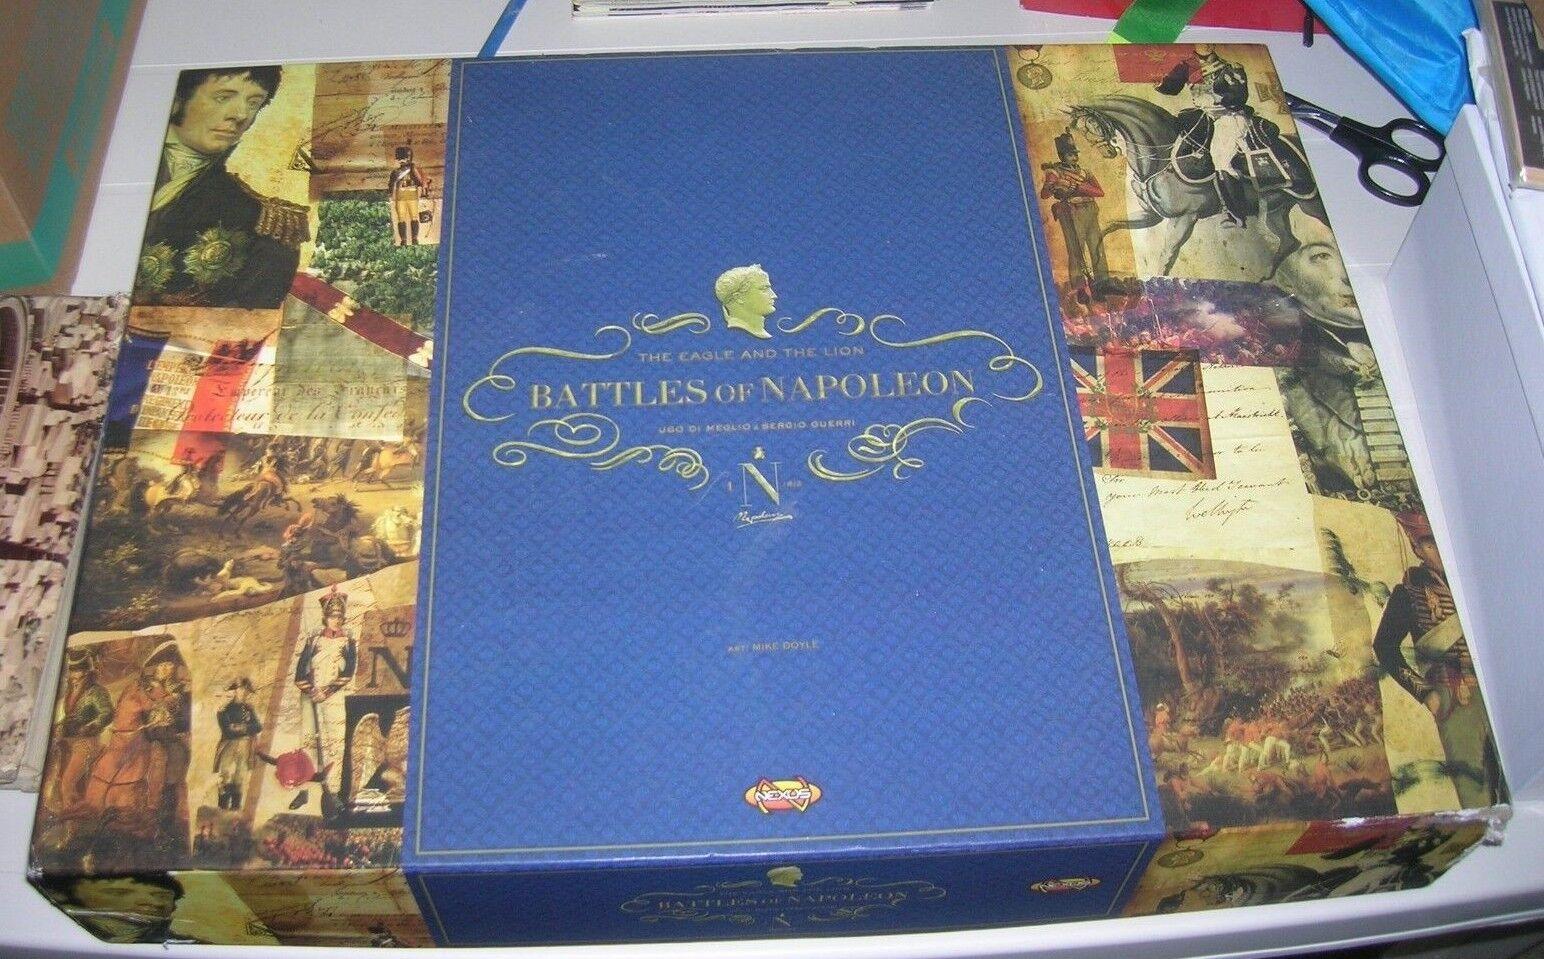 BATTLES OF NAPOLEON  THE EAGLE AND THE LION  - ITALIANO - mai giocato